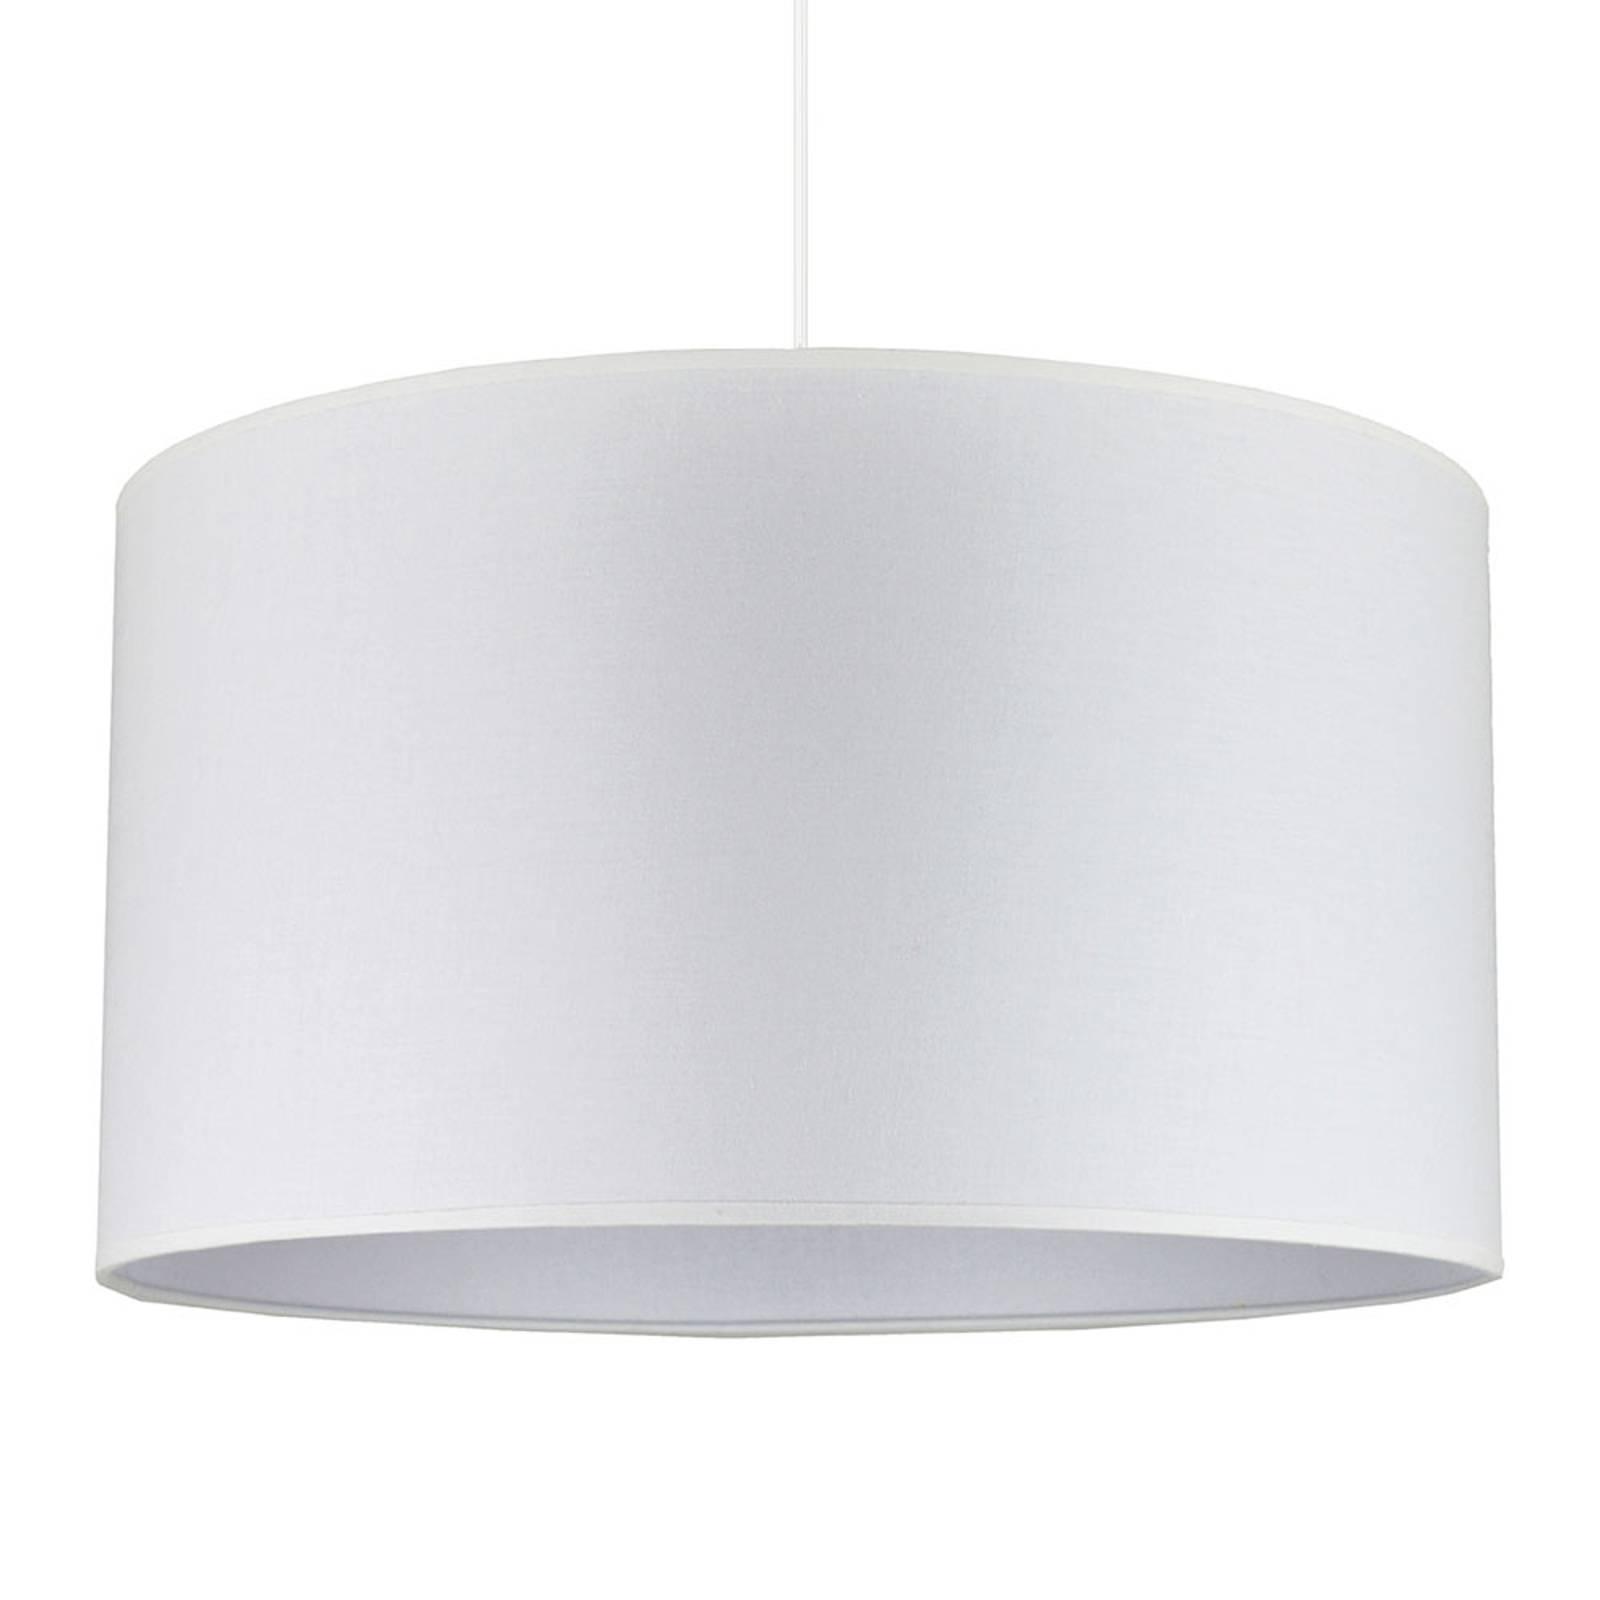 Lampa wisząca Roller, biała